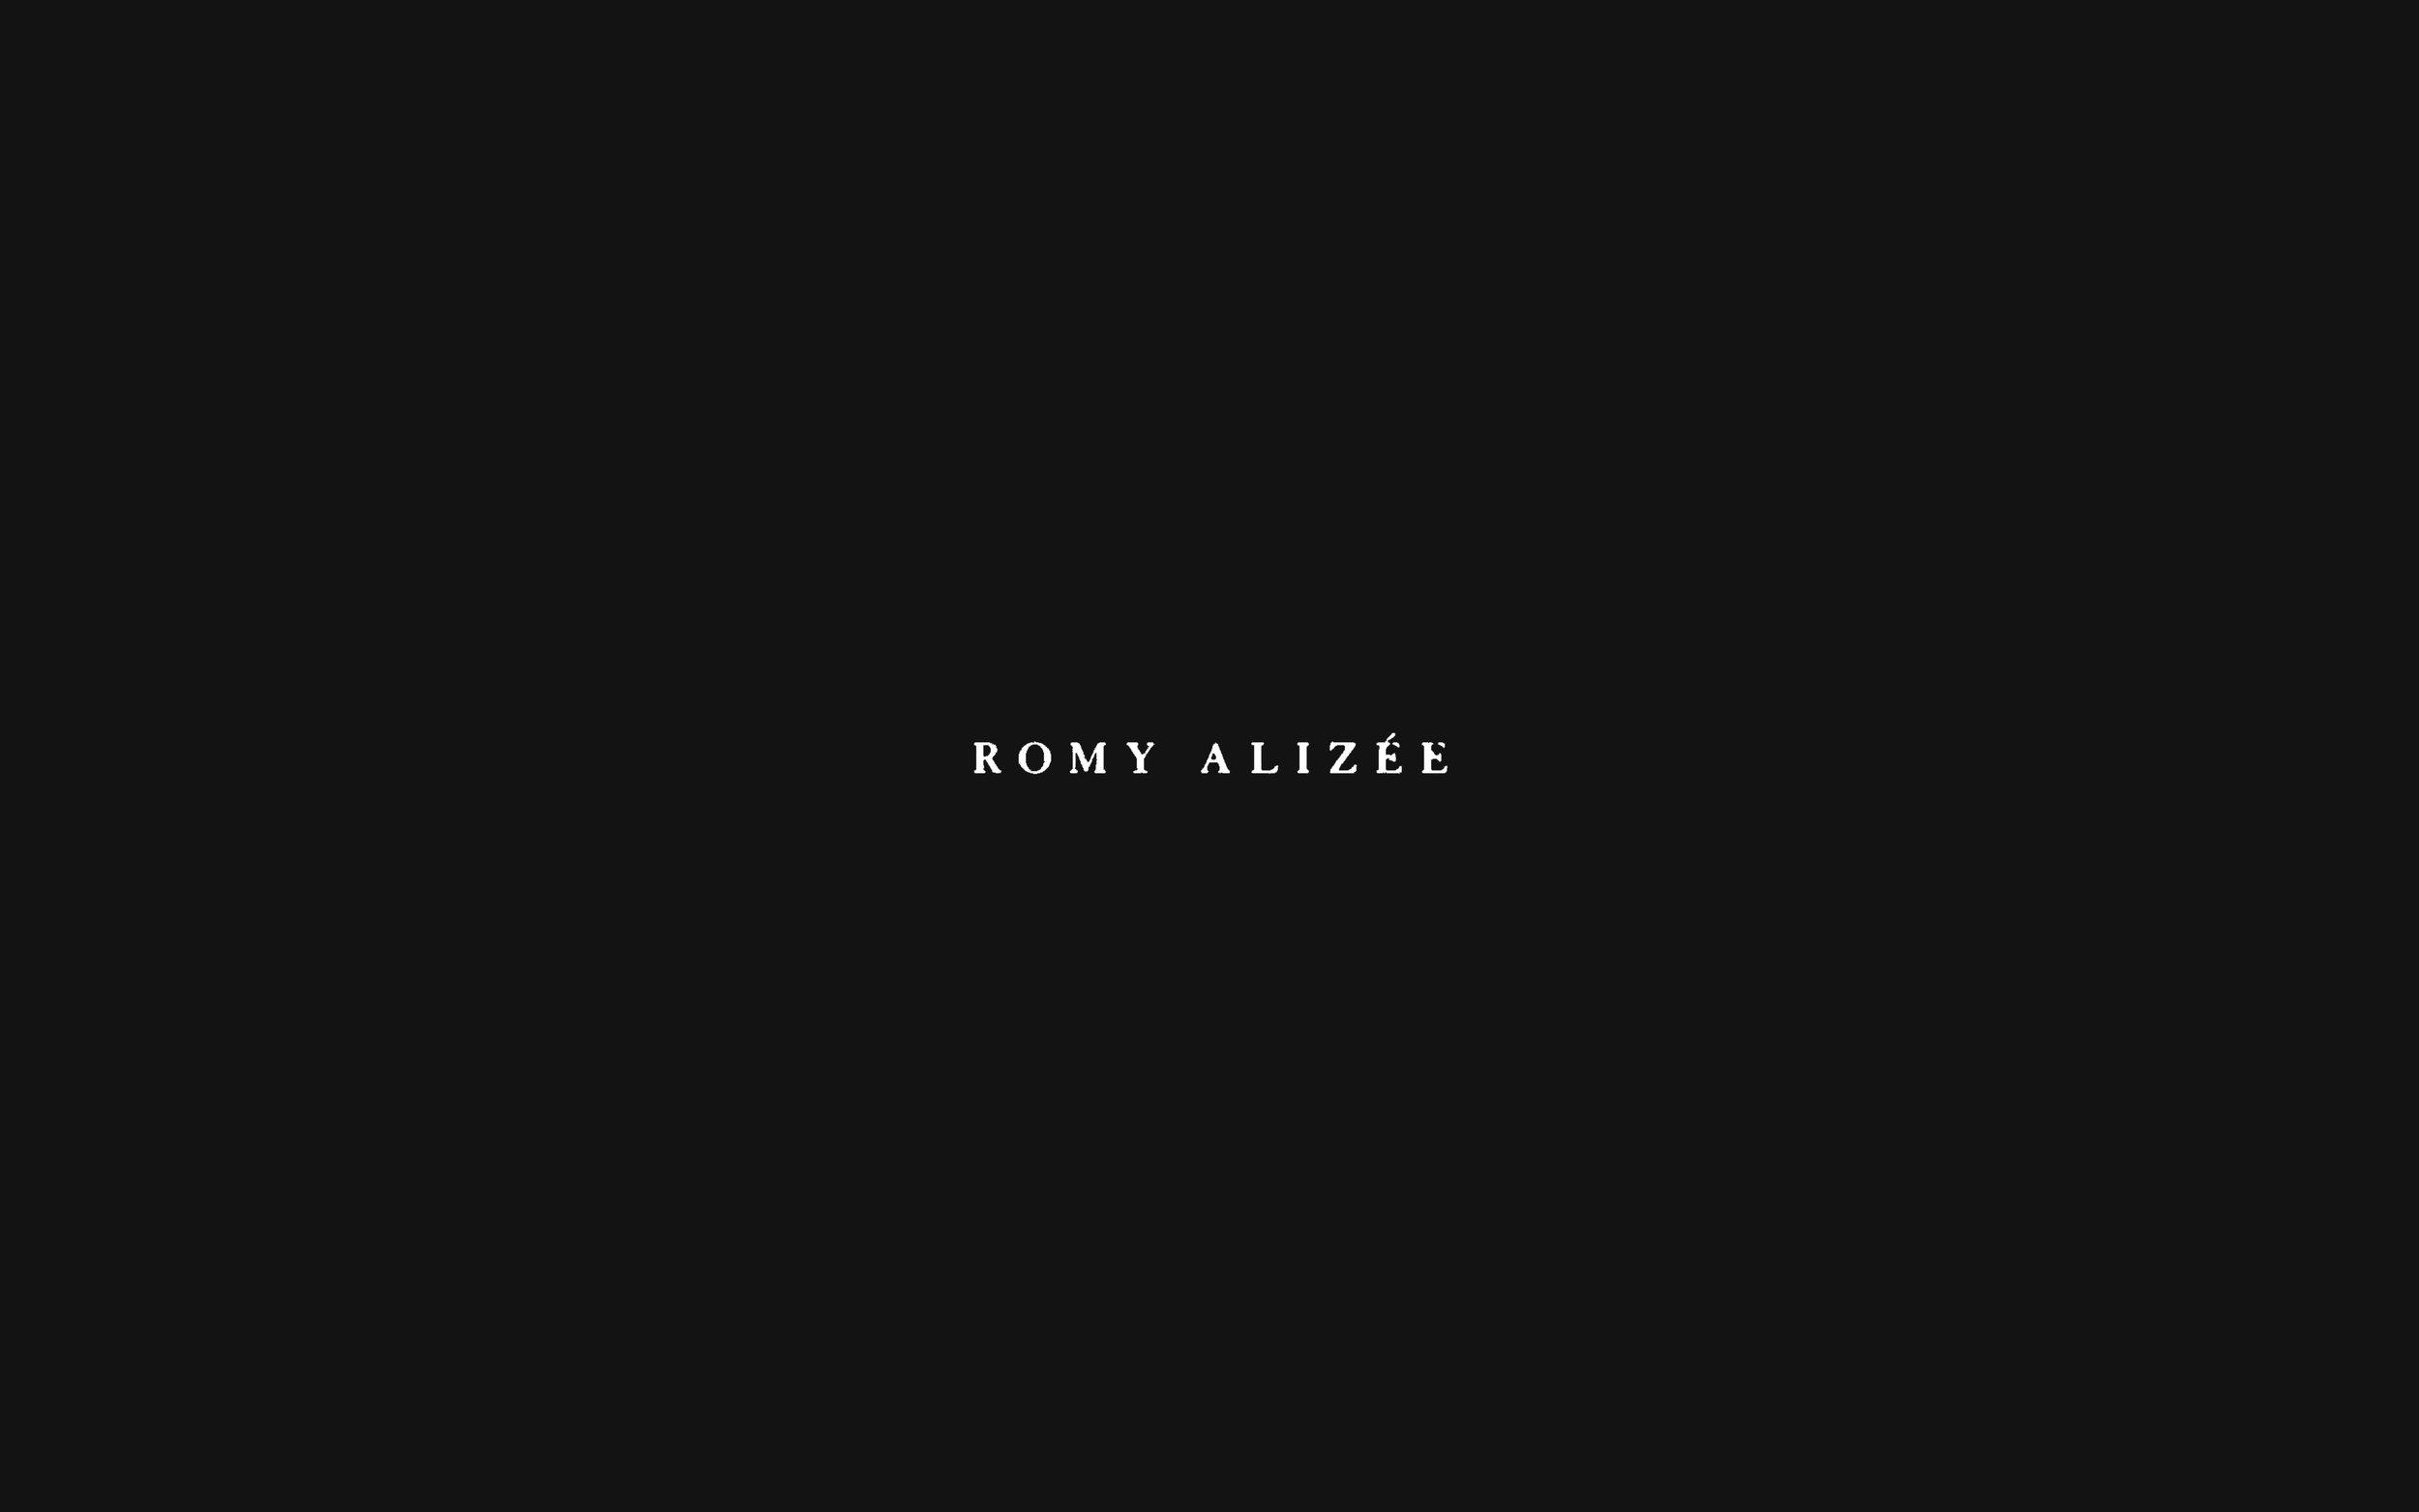 2B__Romy_Alizée_00.jpg